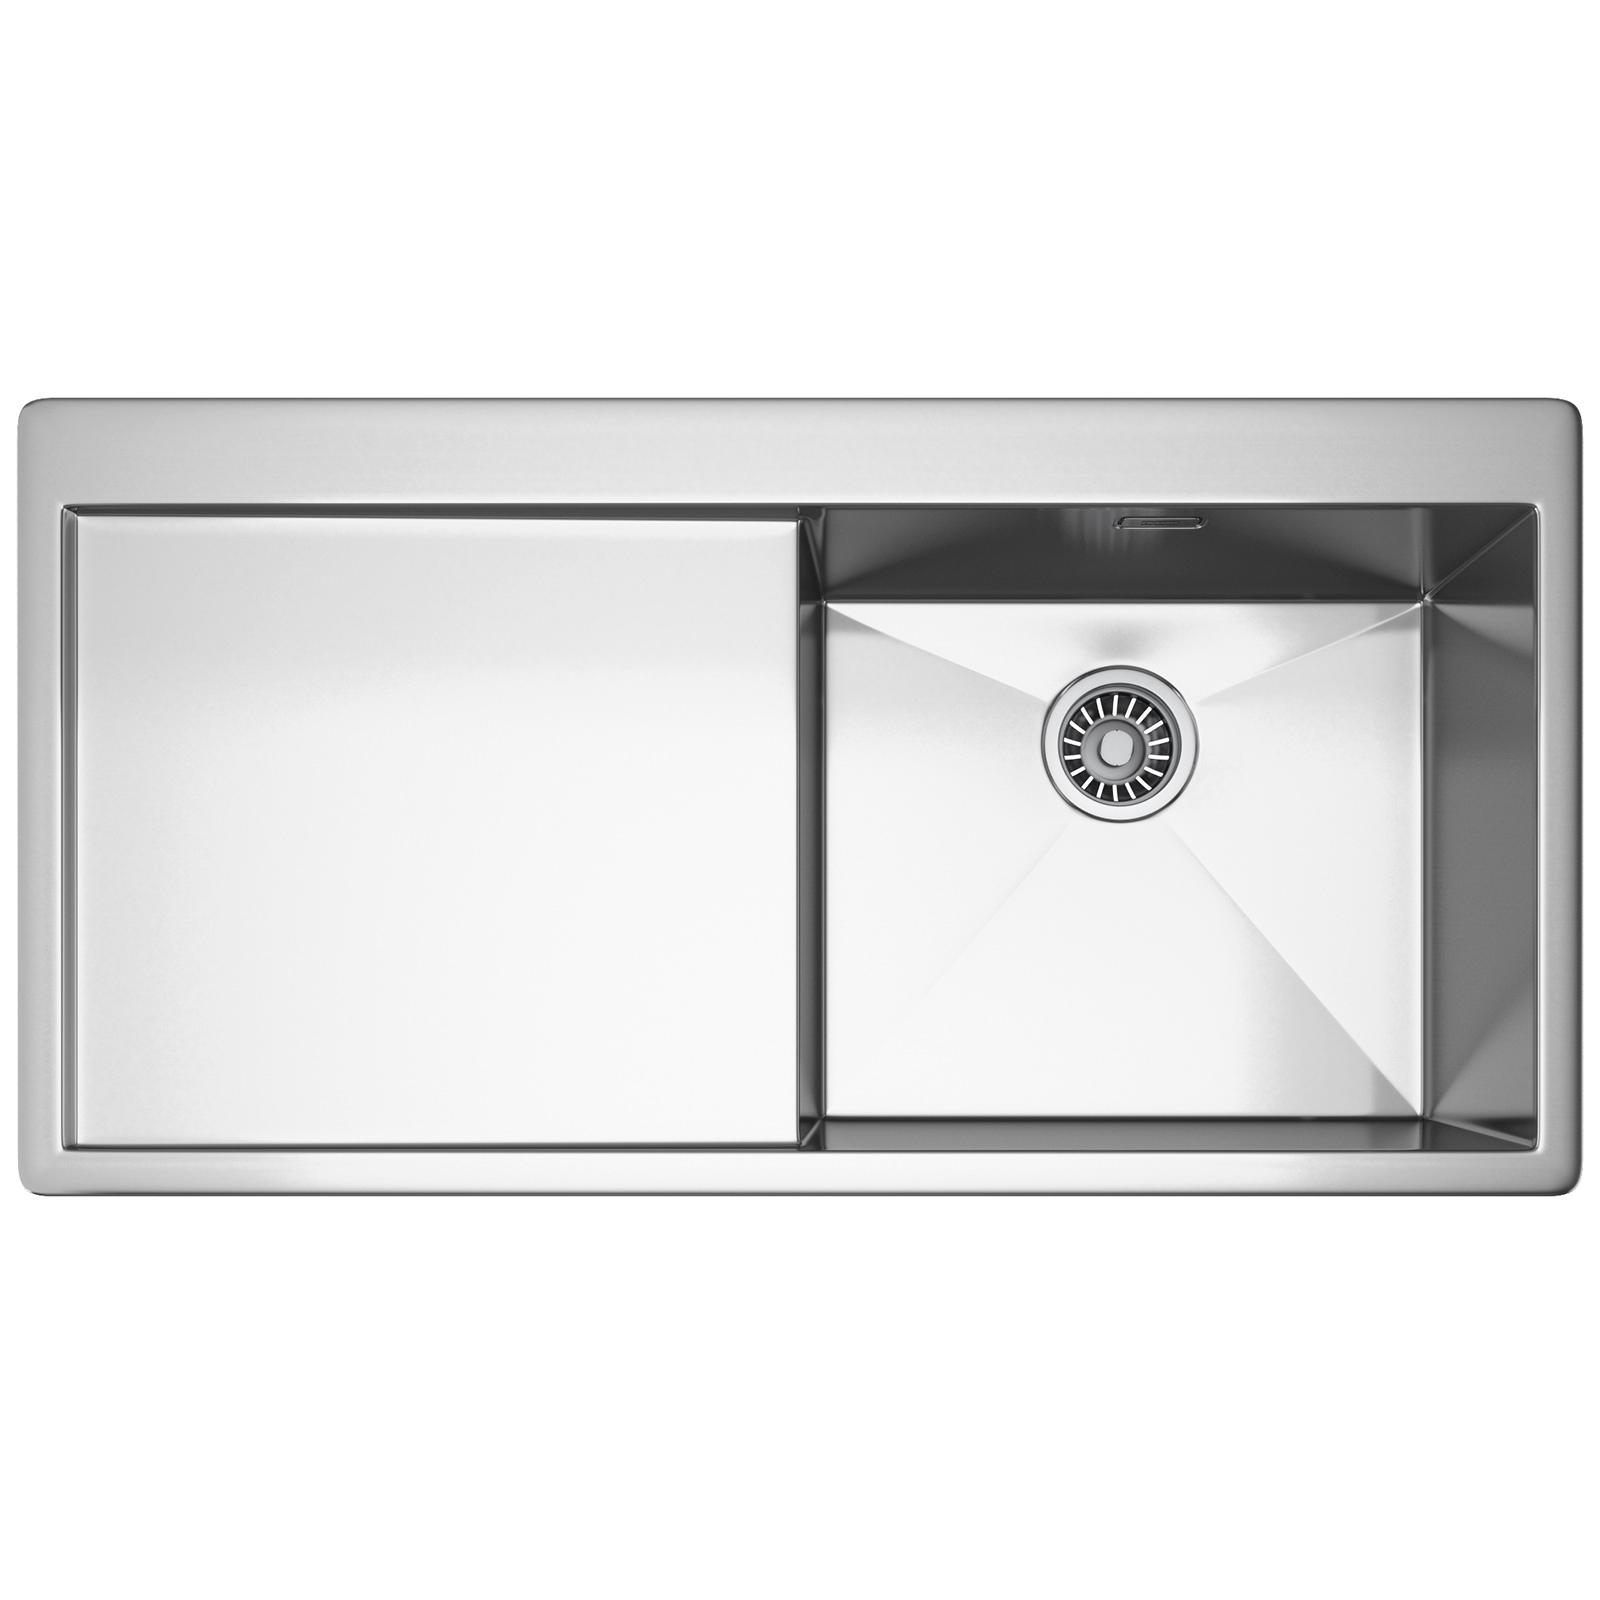 franke planar ppx 211 stainless steel left hand drainer 10 bowl inset sink - Franke Sink